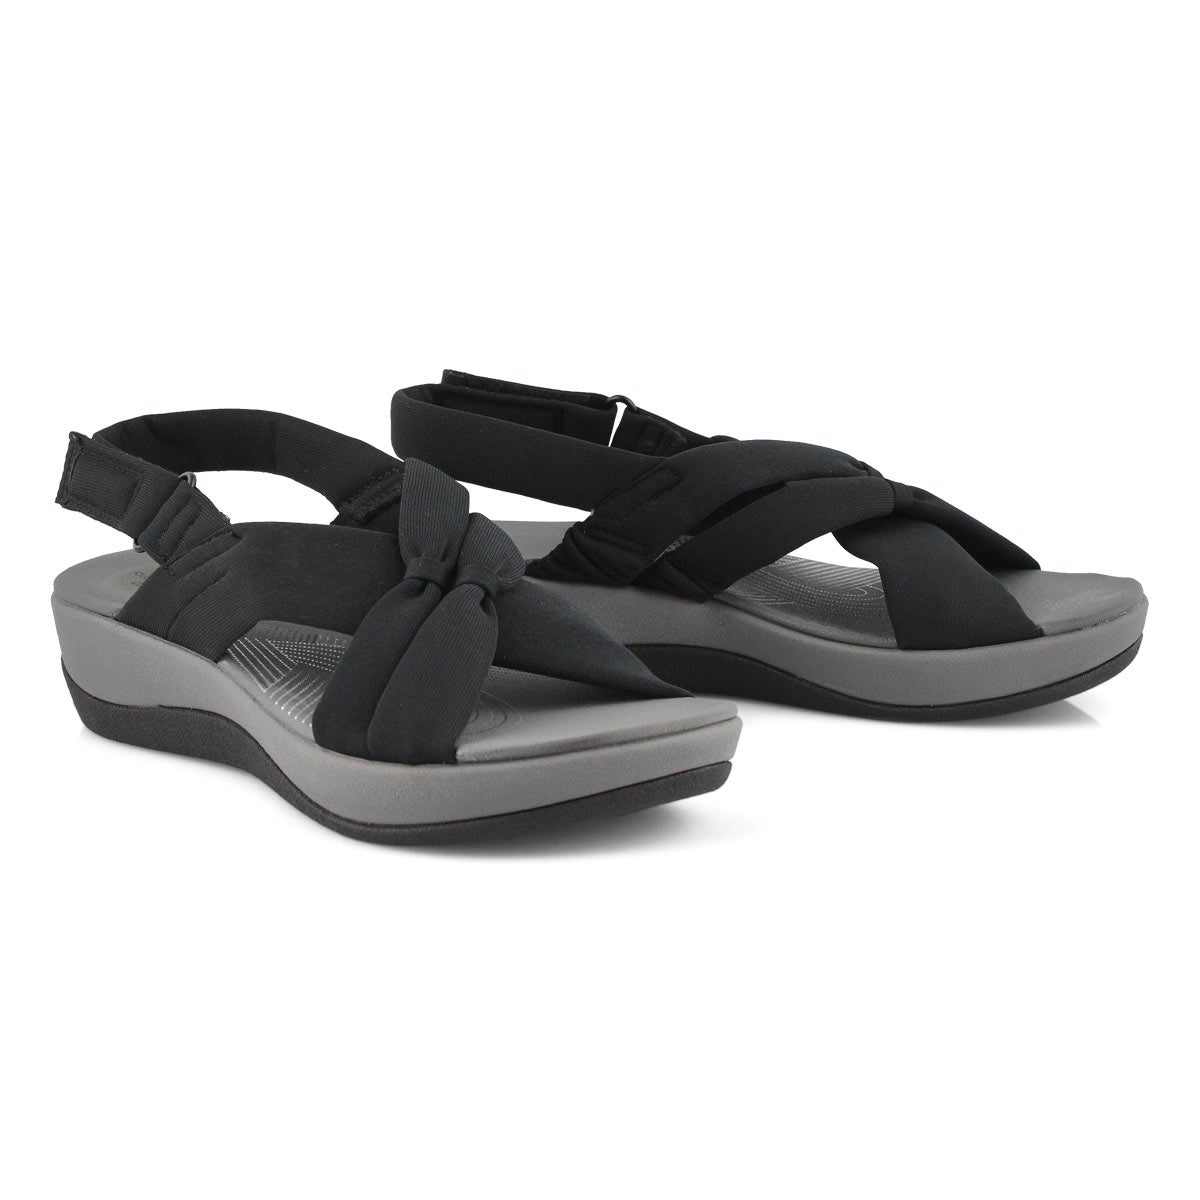 Lds Arla Belle black casual sandal